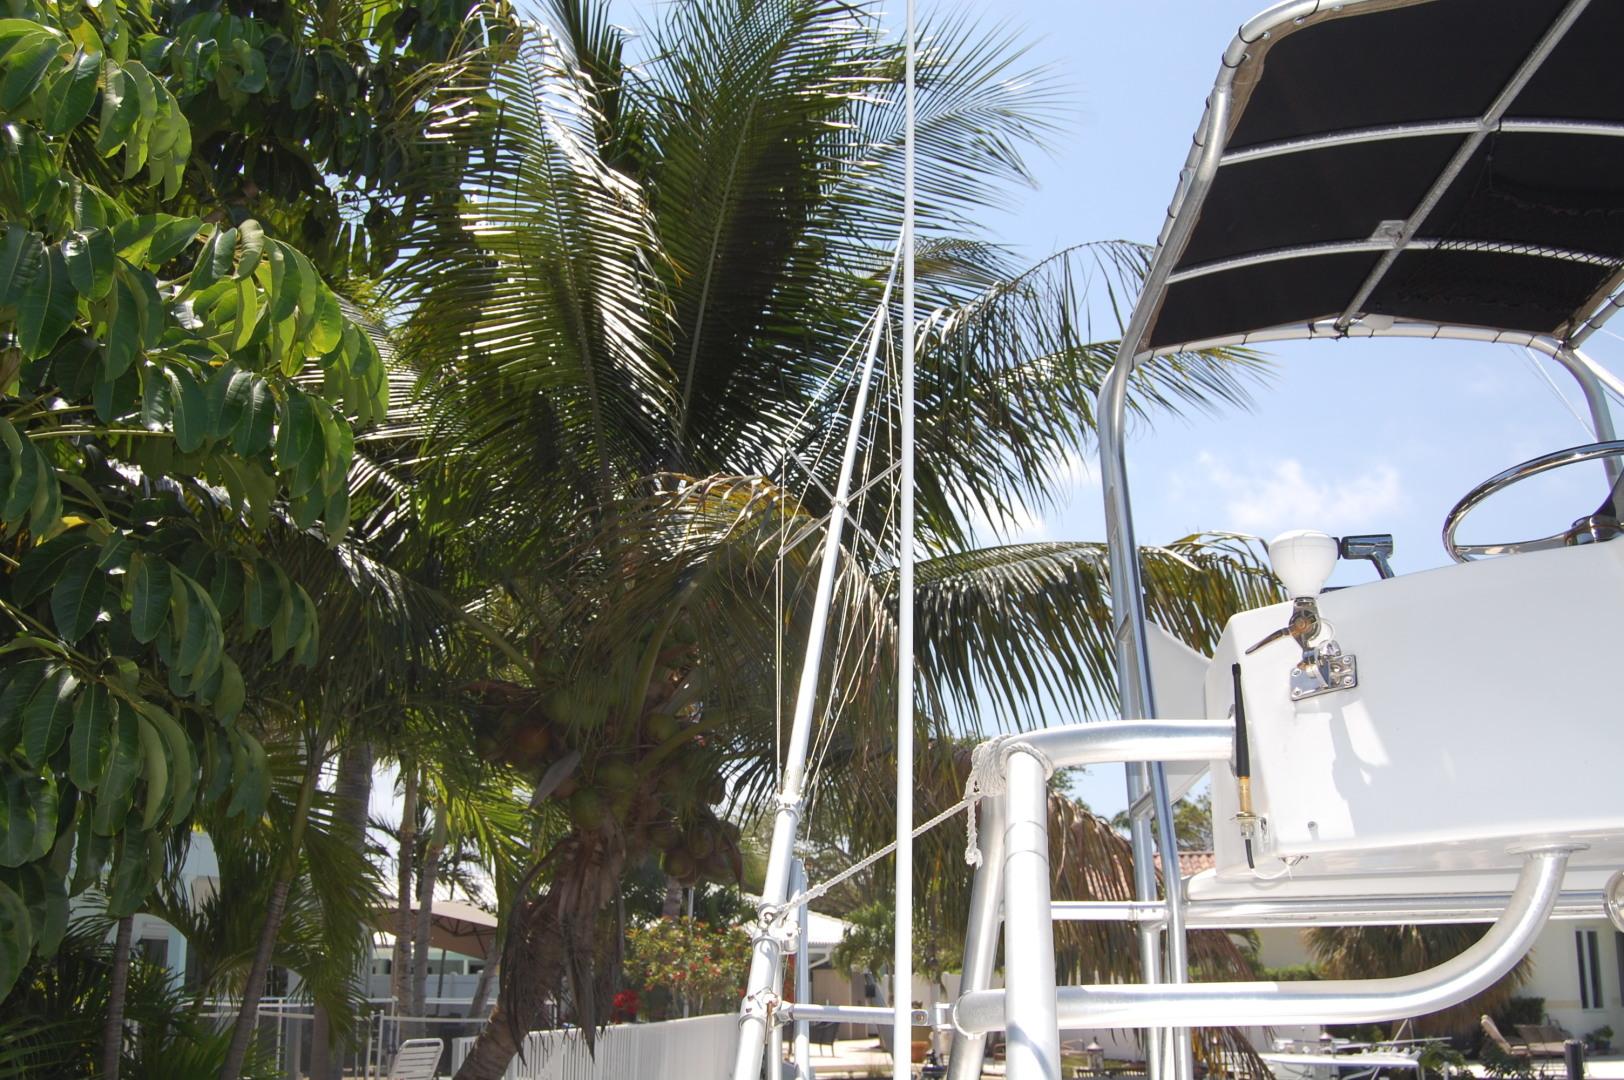 Pro-Line-35 Express 2006-Black Pearl Lighthouse Point-Florida-United States-1369934   Thumbnail